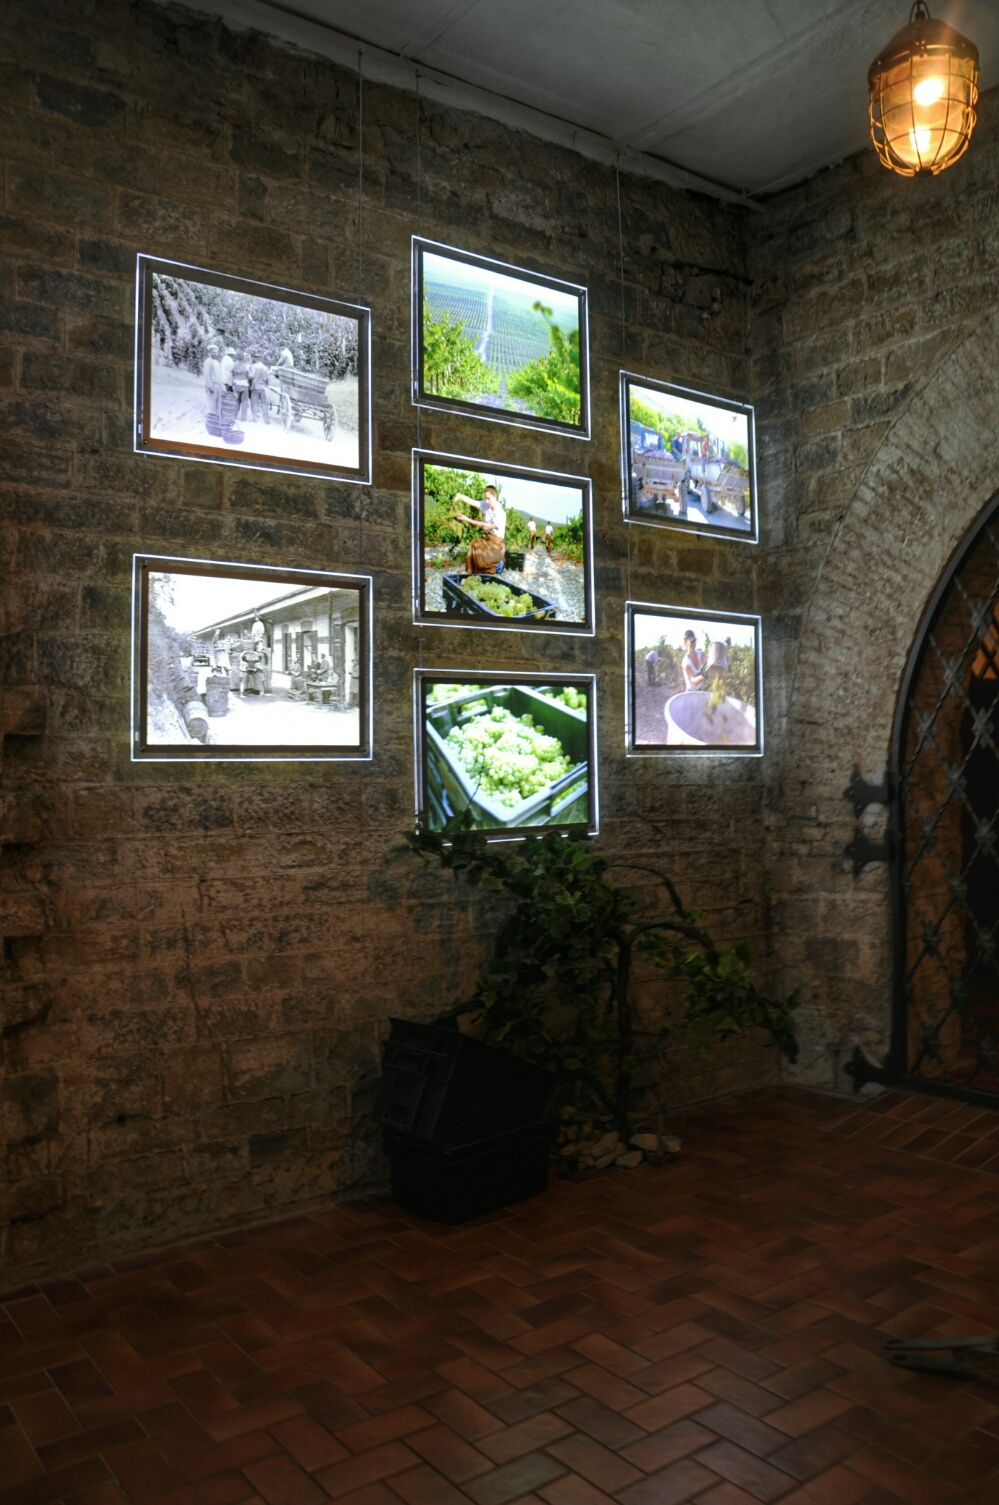 Фото архив с историей сбора винограда